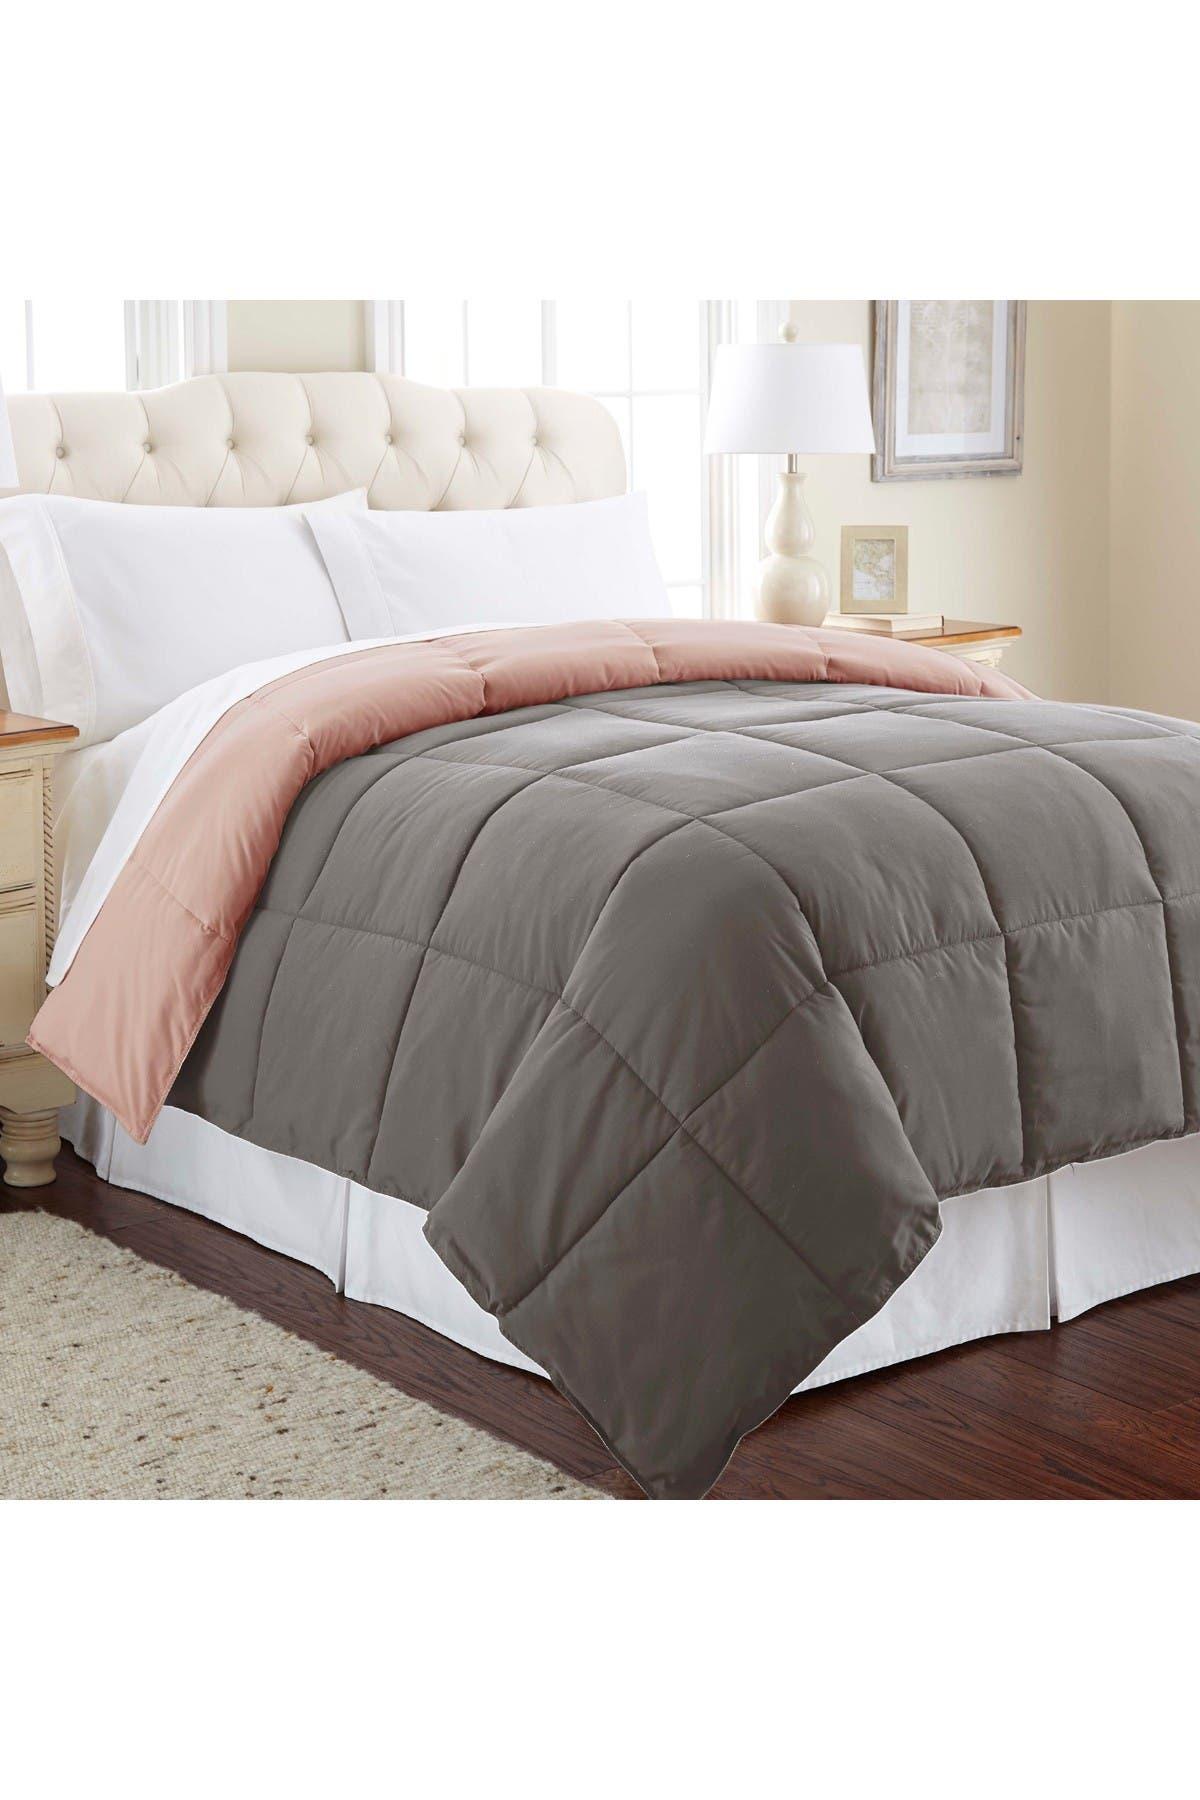 Image of Modern Threads King Down Alternative Reversible Comforter - Charcoal/Misty Rose